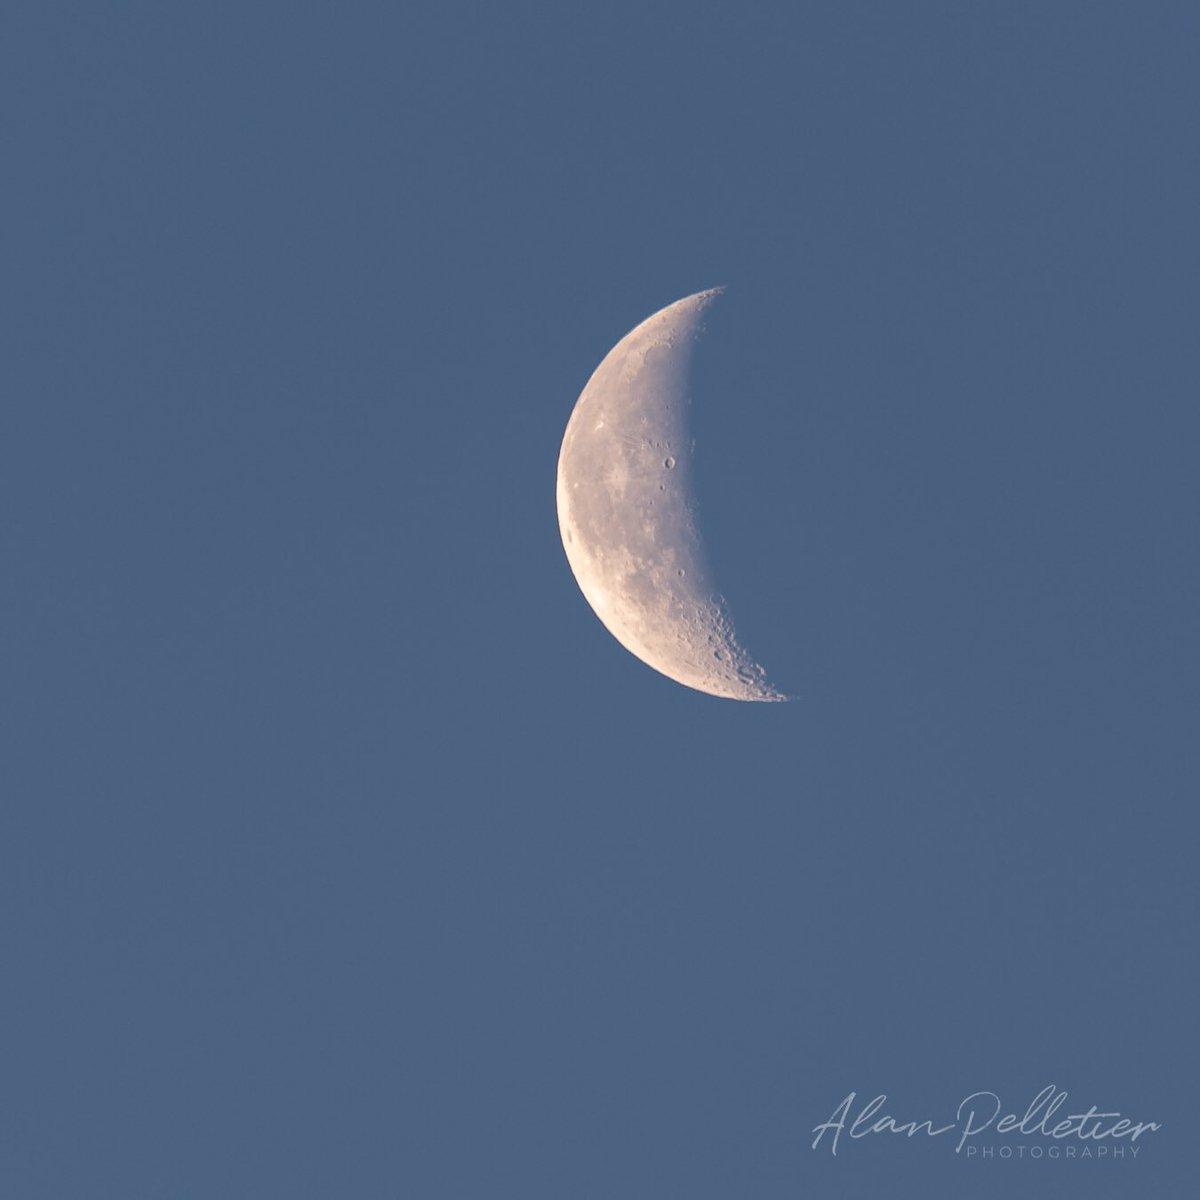 Recent shot of the early morning moon. #FridayFunDay #TGIF #MOON #MoonLovers #Moonshot #earlybird #bluehour #FridayMorning #morning #picoftheday #PHOTOS #ThePhotoHour #astronomy #photographyeveryday #nikon #nikonphotographypic.twitter.com/SrsOsgz8Bx